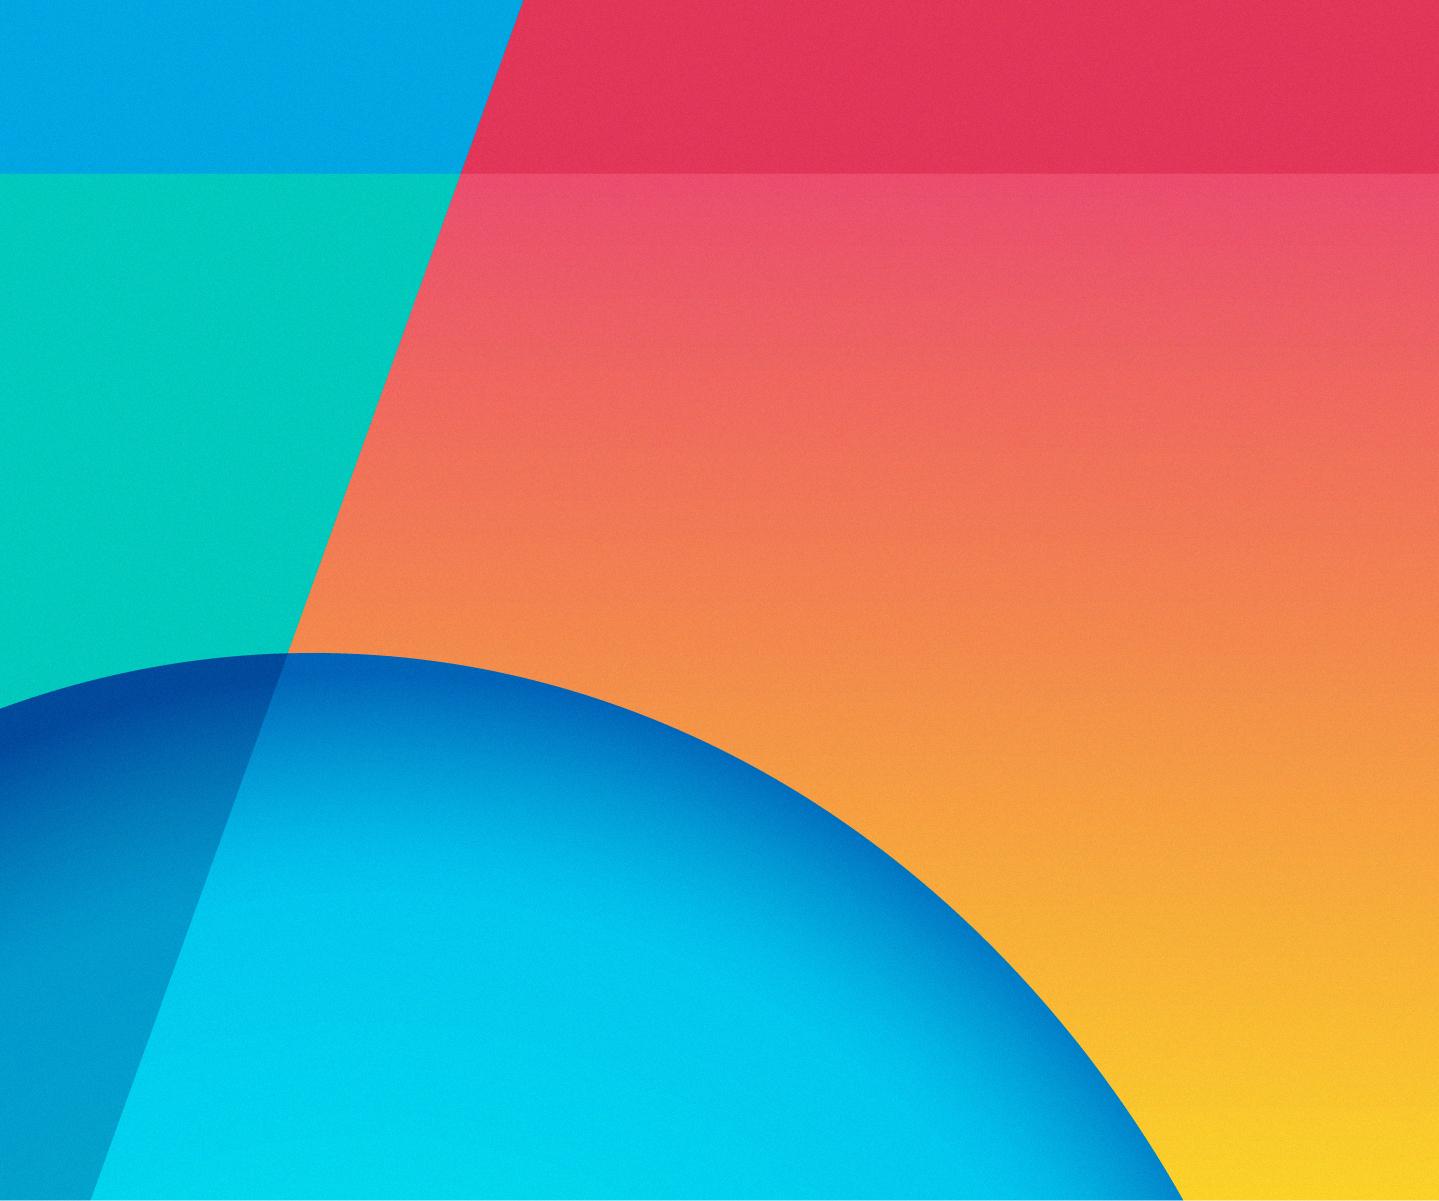 Nexus 5][KITKAT][STOCK Google Nexus 4 1439x1201